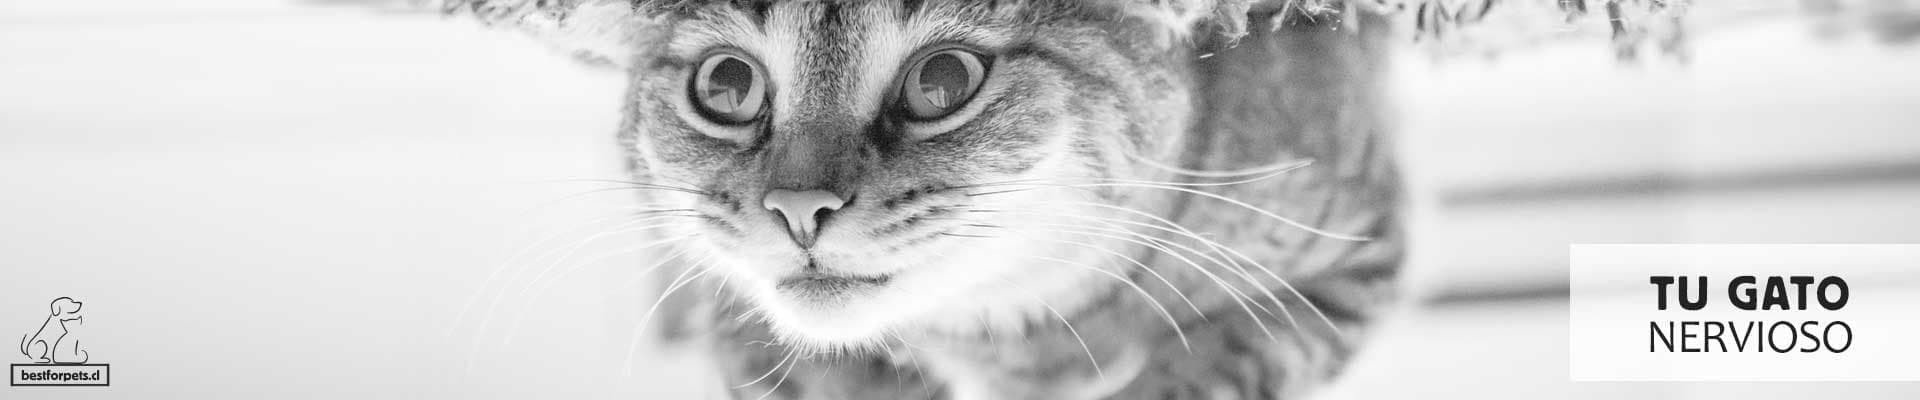 Te ayudamos con tu gato nervioso